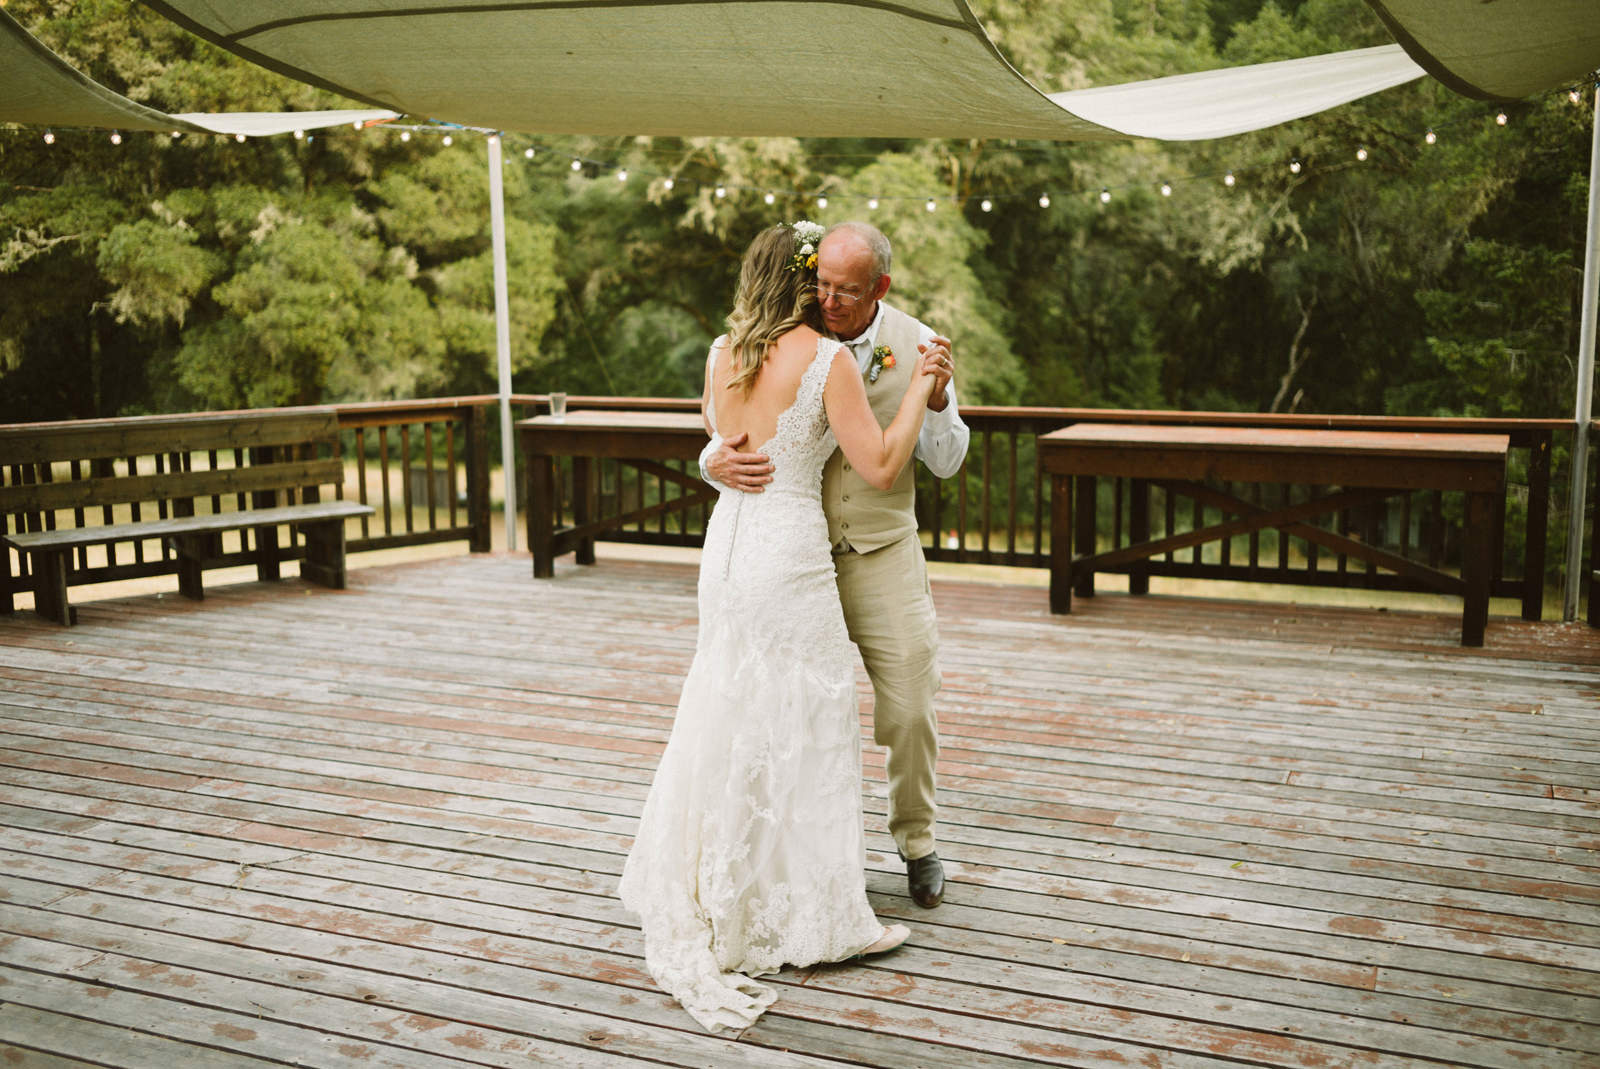 rivers-bend-retreat-wedding-091 RIVER'S BEND RETREAT WEDDING